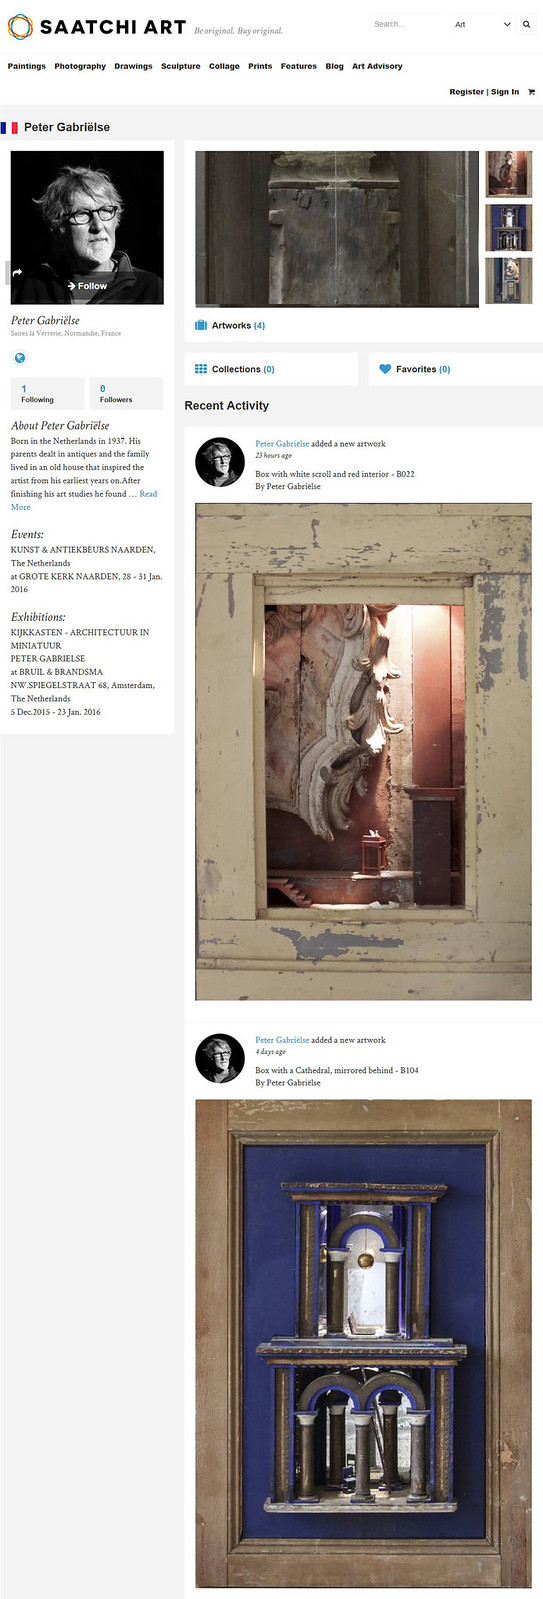 'Peter Gabriëlse I Saatchi Art' - www_saatchiart_com_petergabrielse